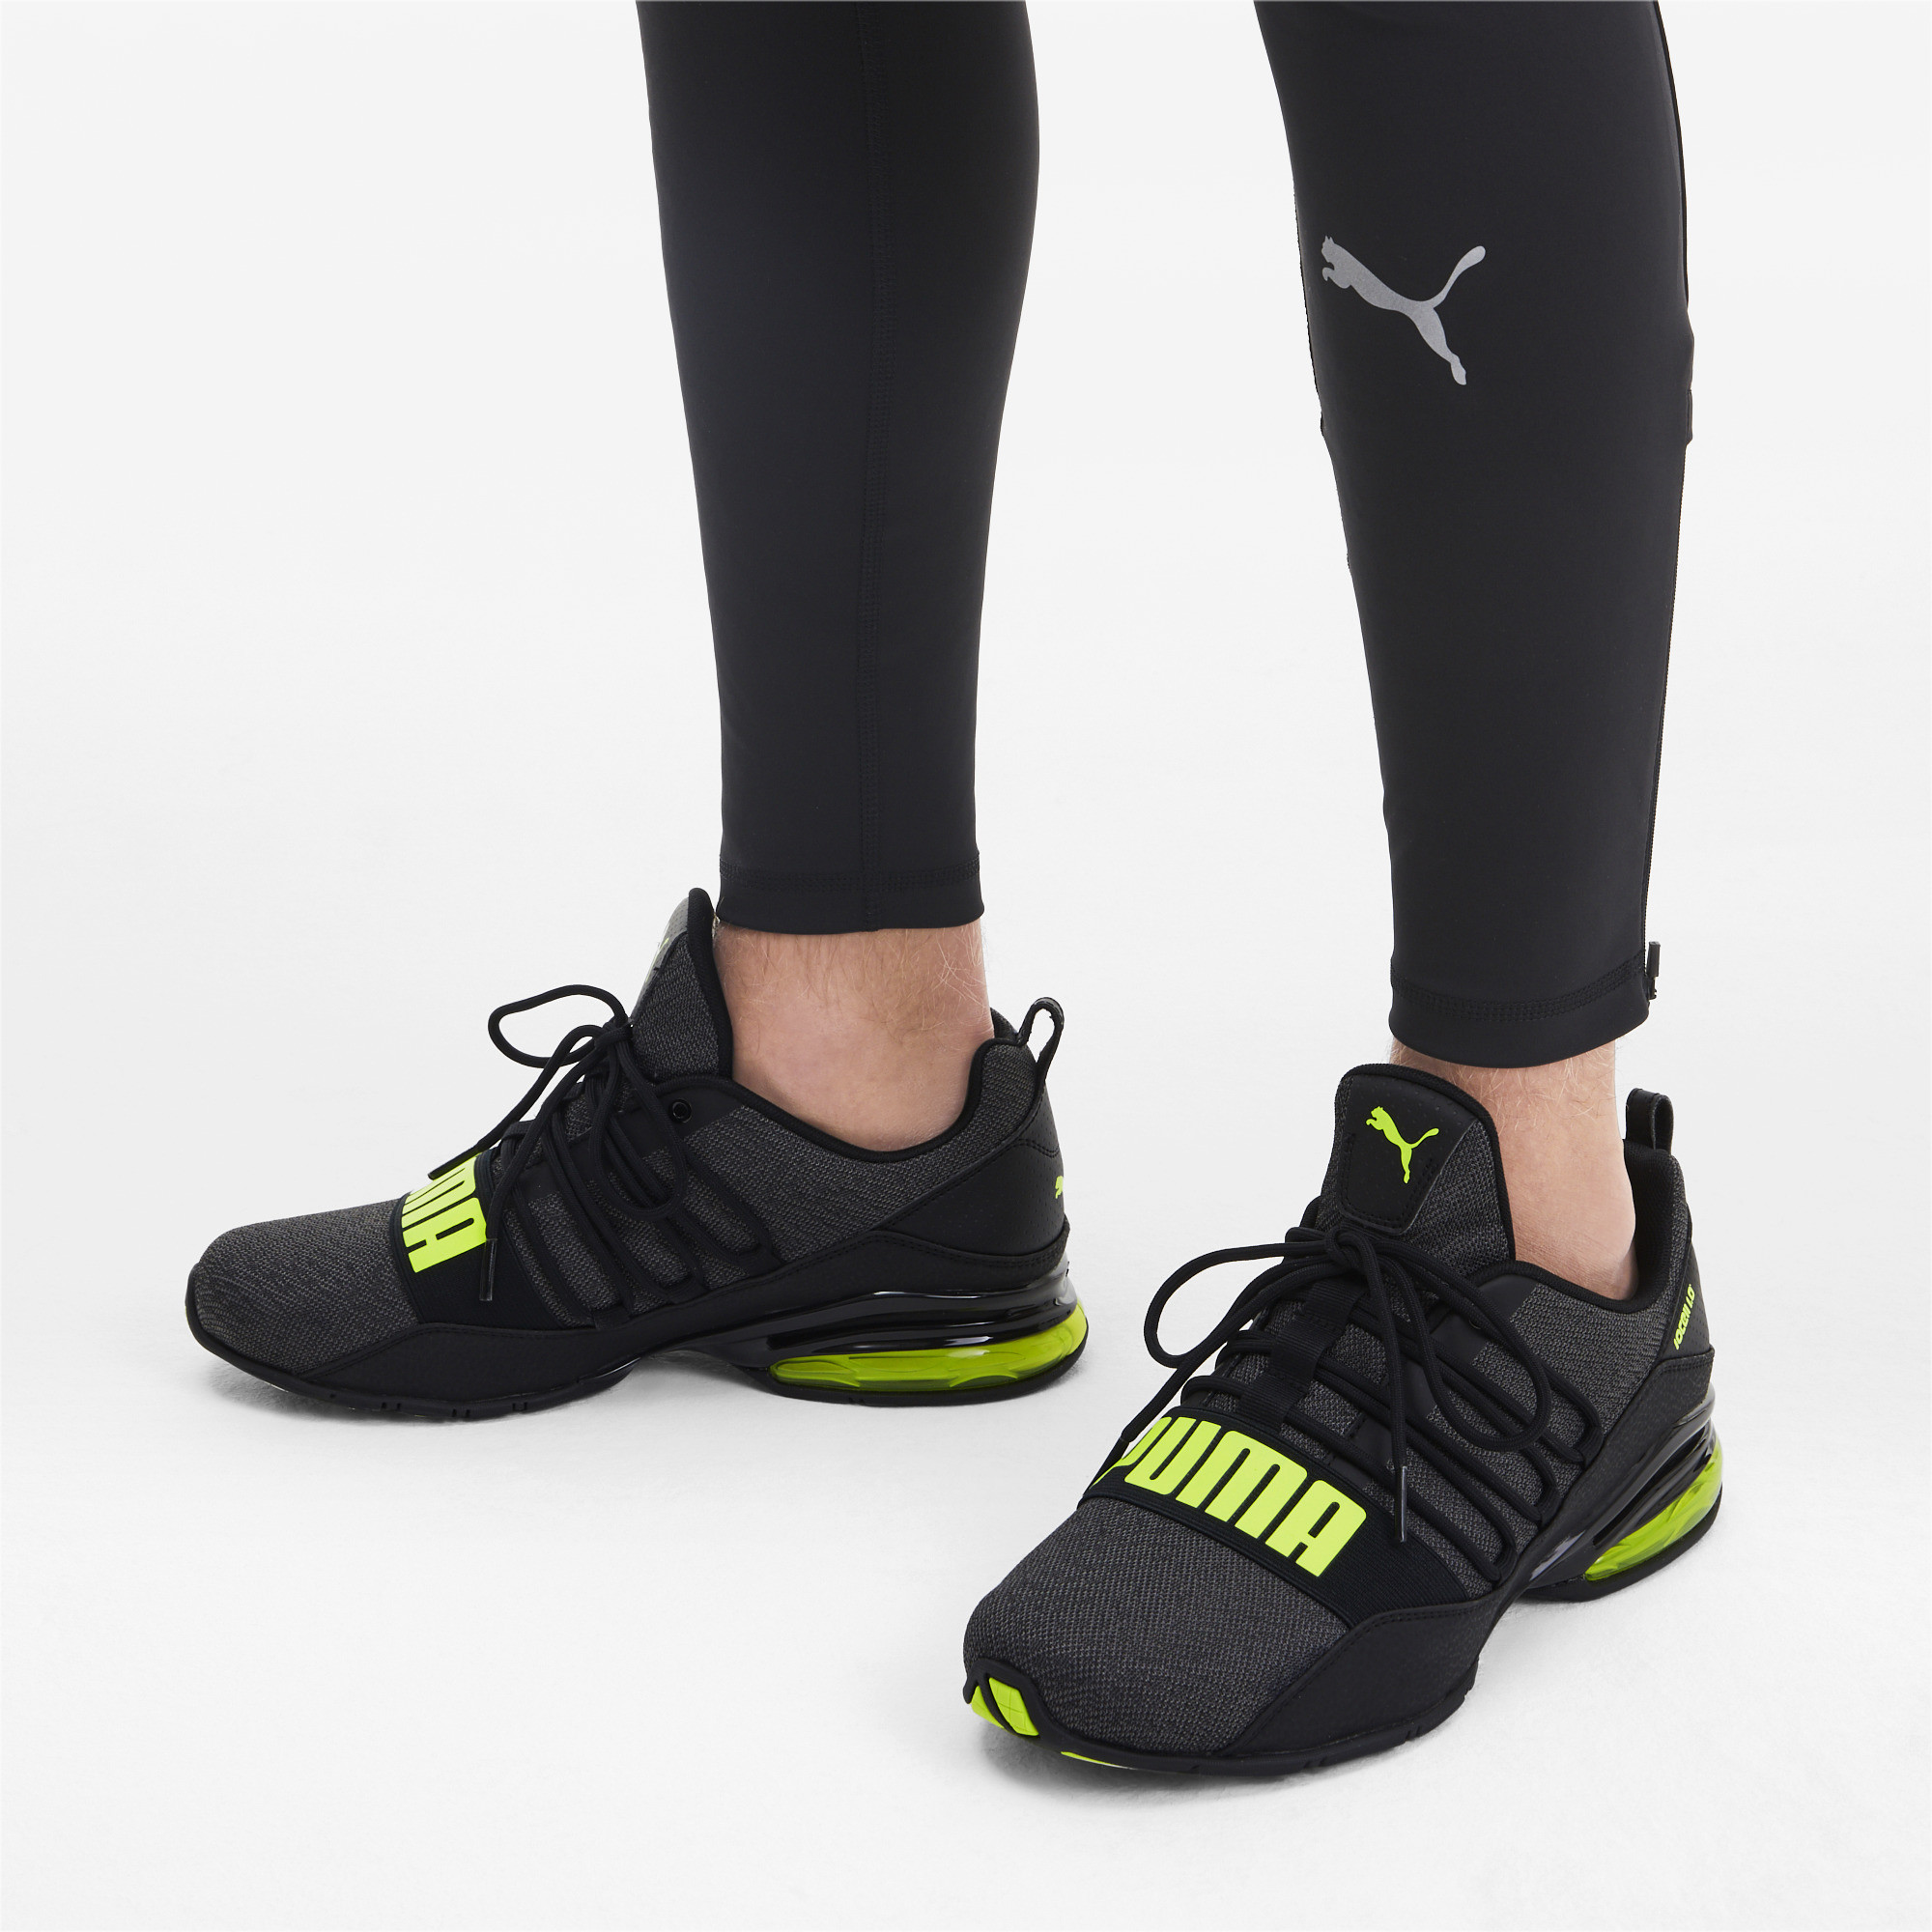 PUMA-Men-039-s-CELL-Regulate-Bold-Training-Shoes thumbnail 19